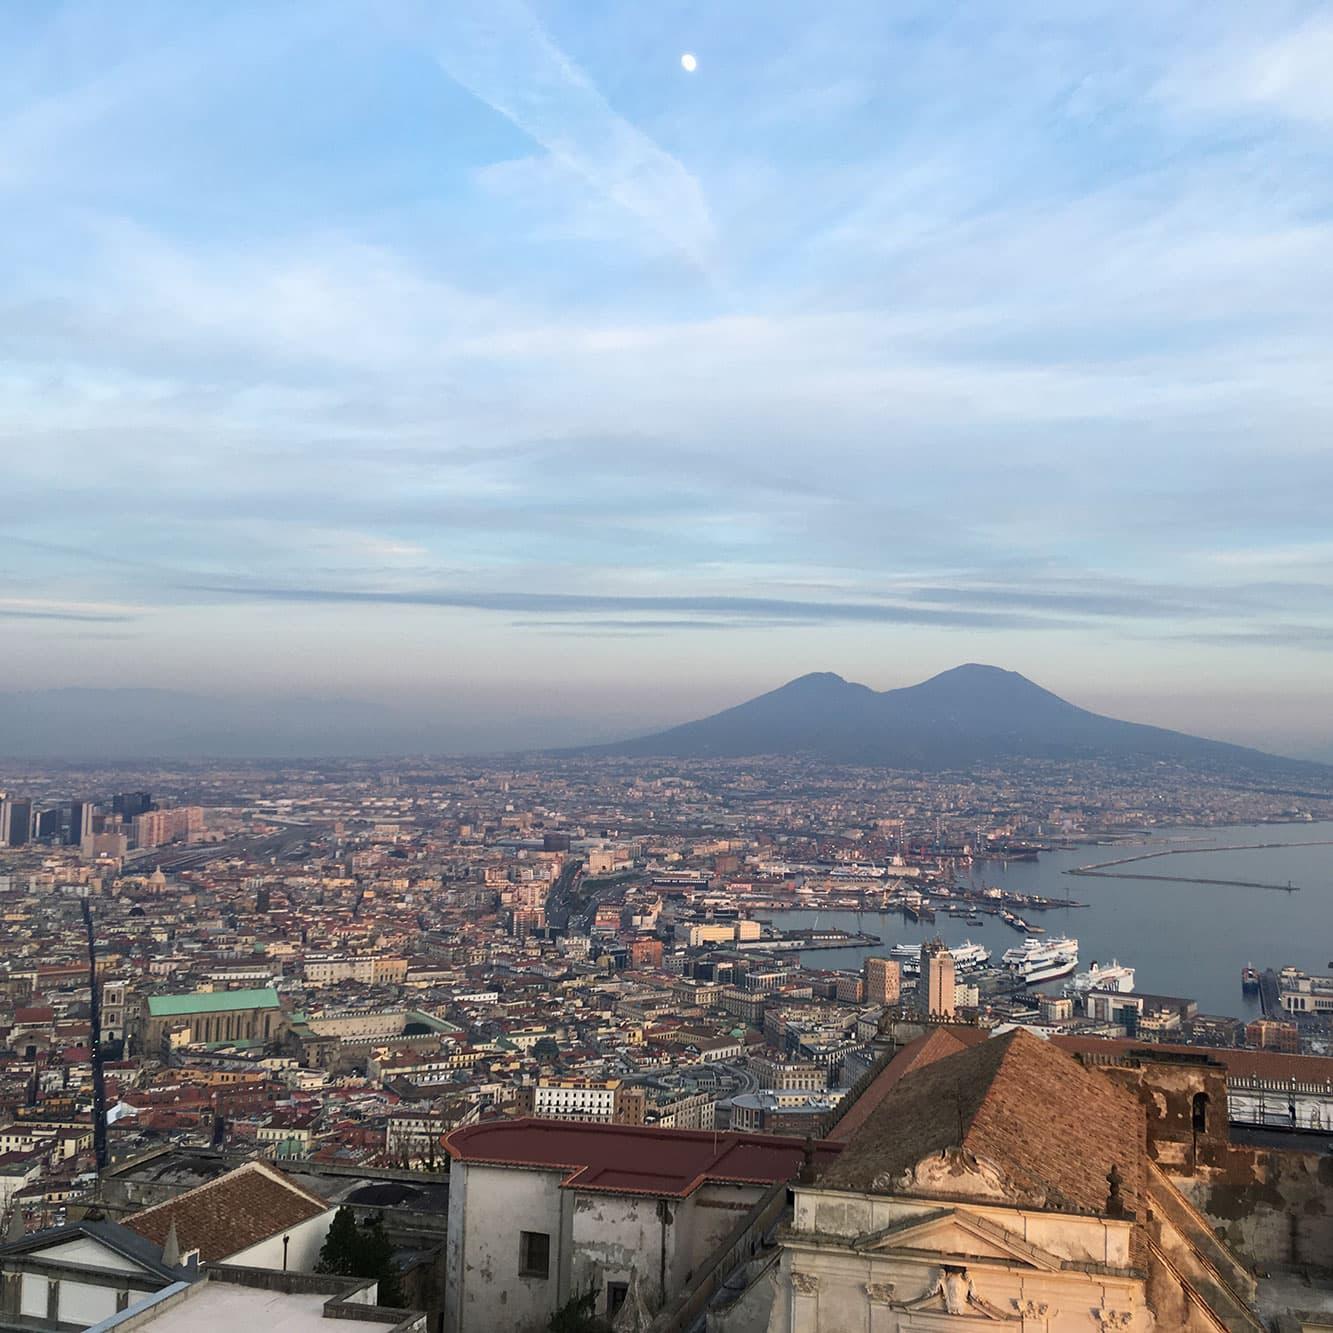 View of Naples and Mount Vesuvius from Castel Sant'Elmo